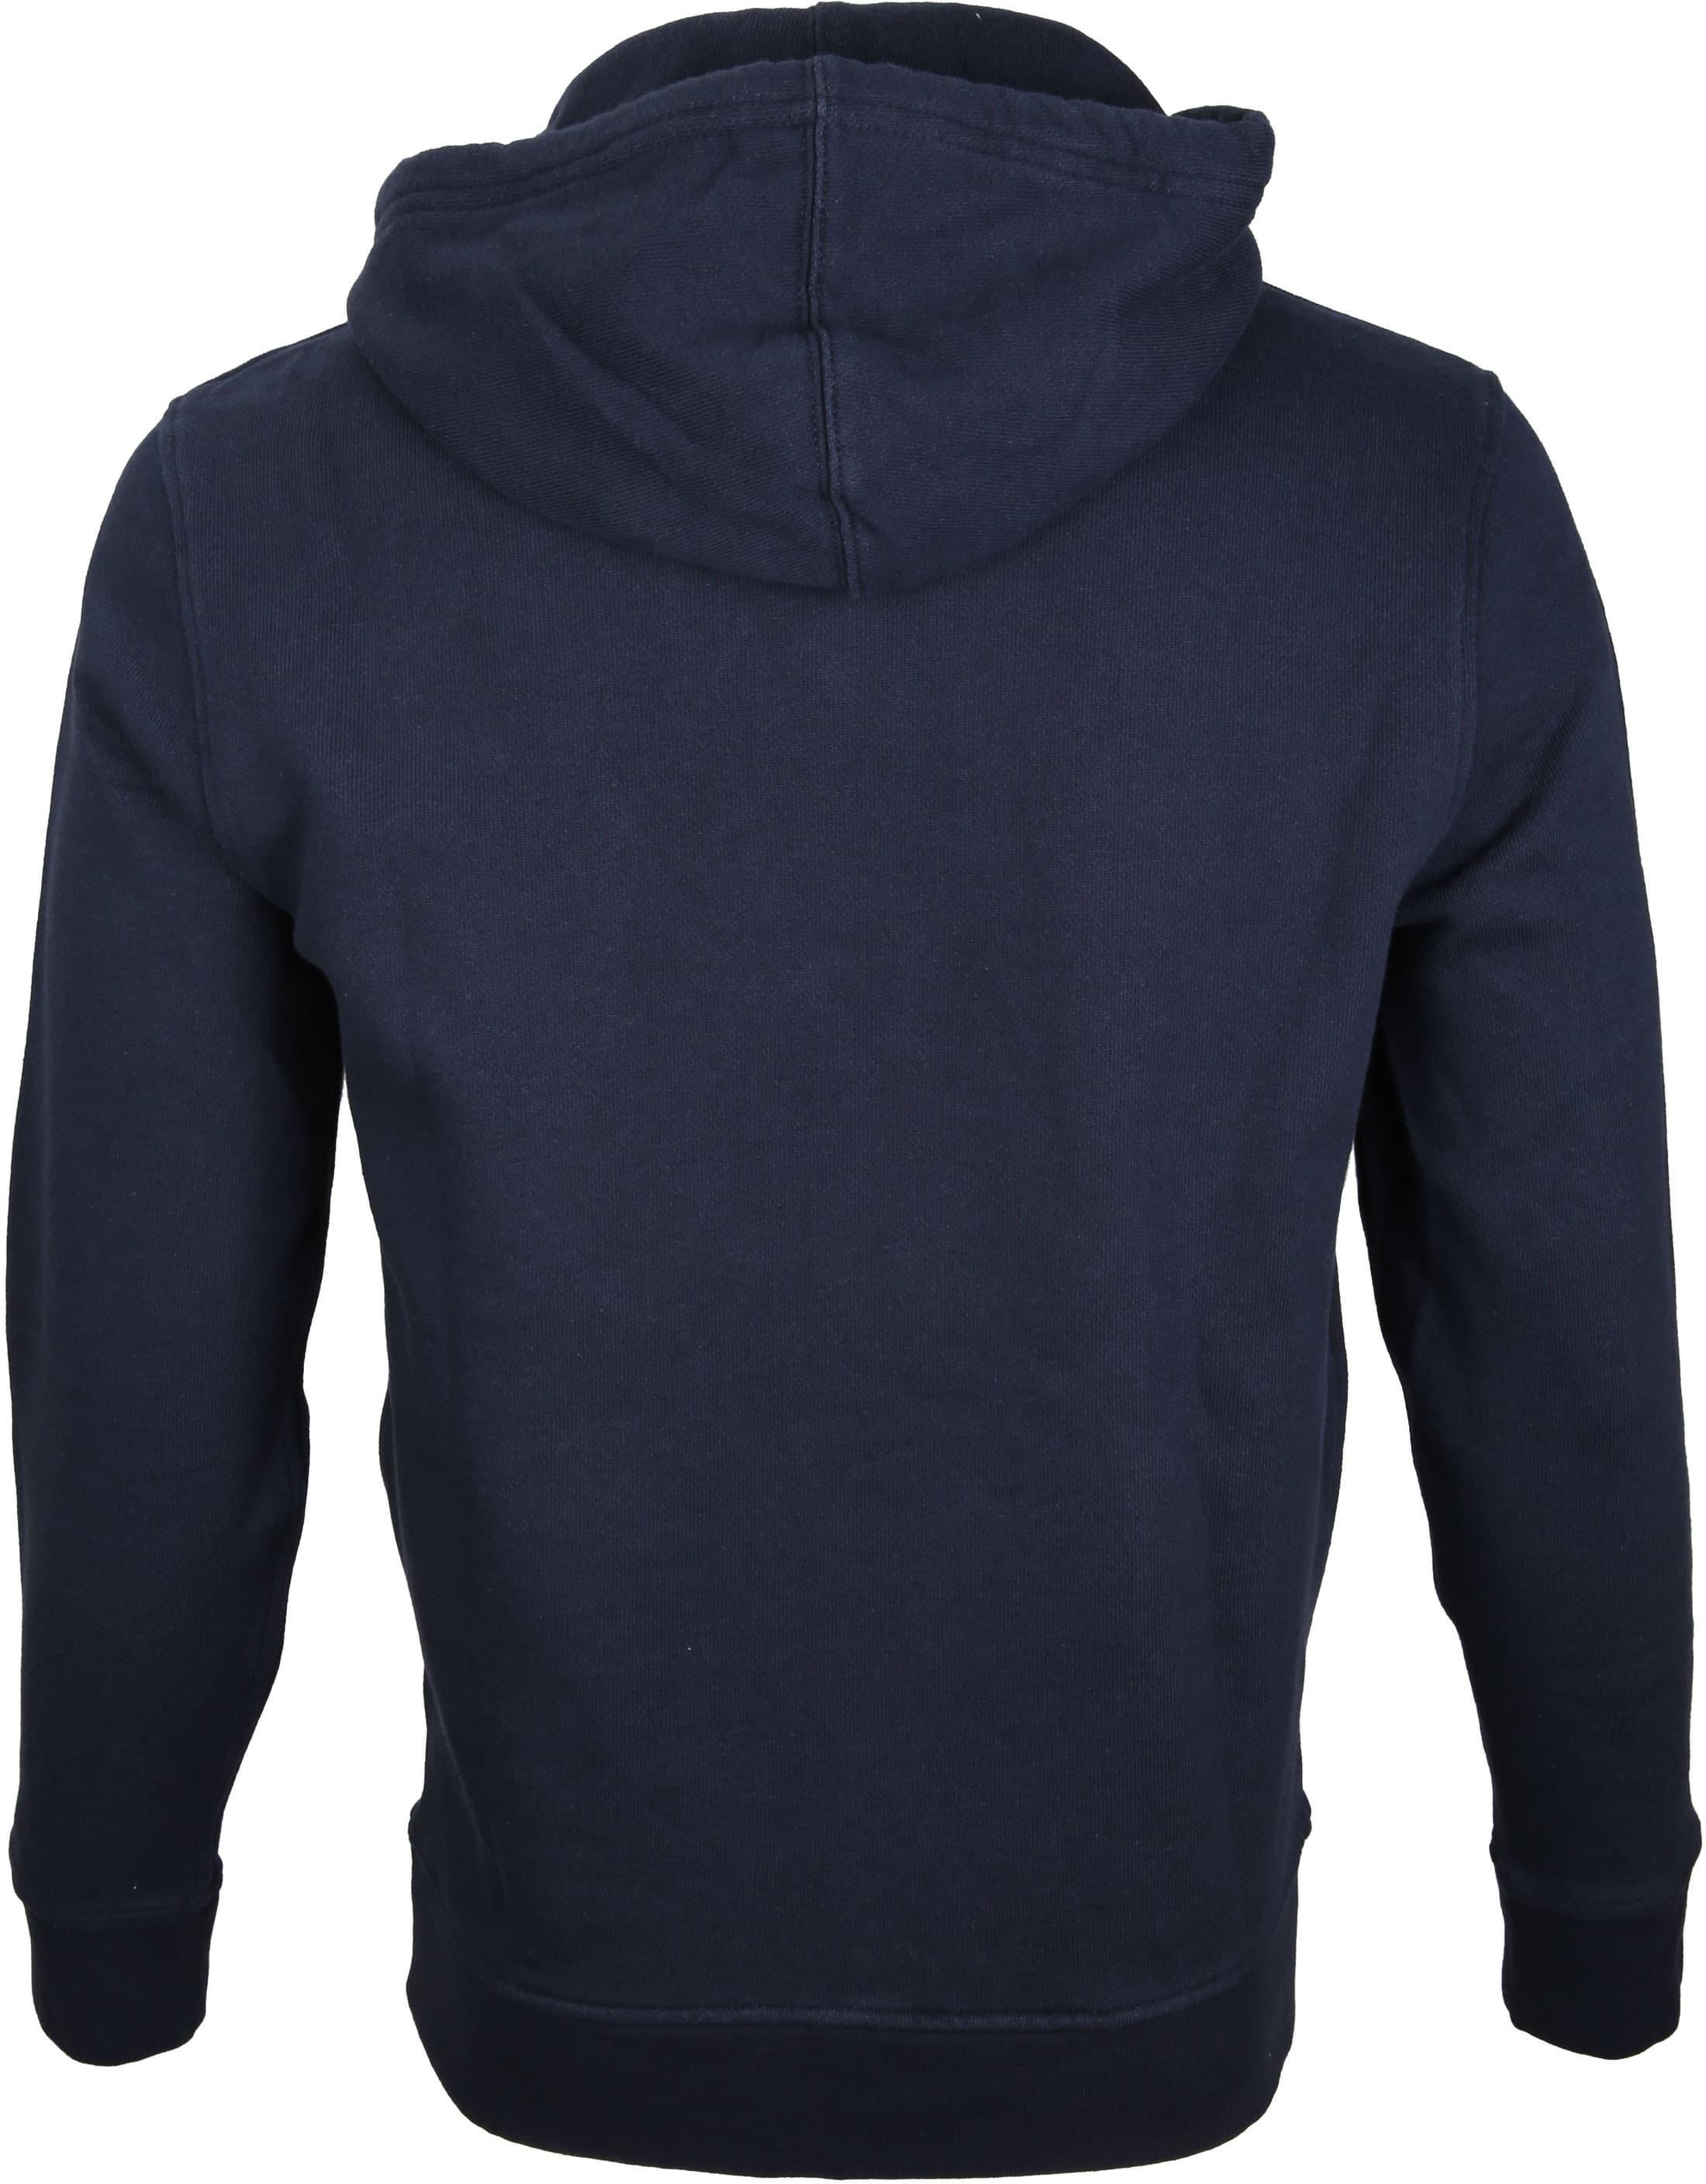 Levi's Sweater Captain Navy foto 2